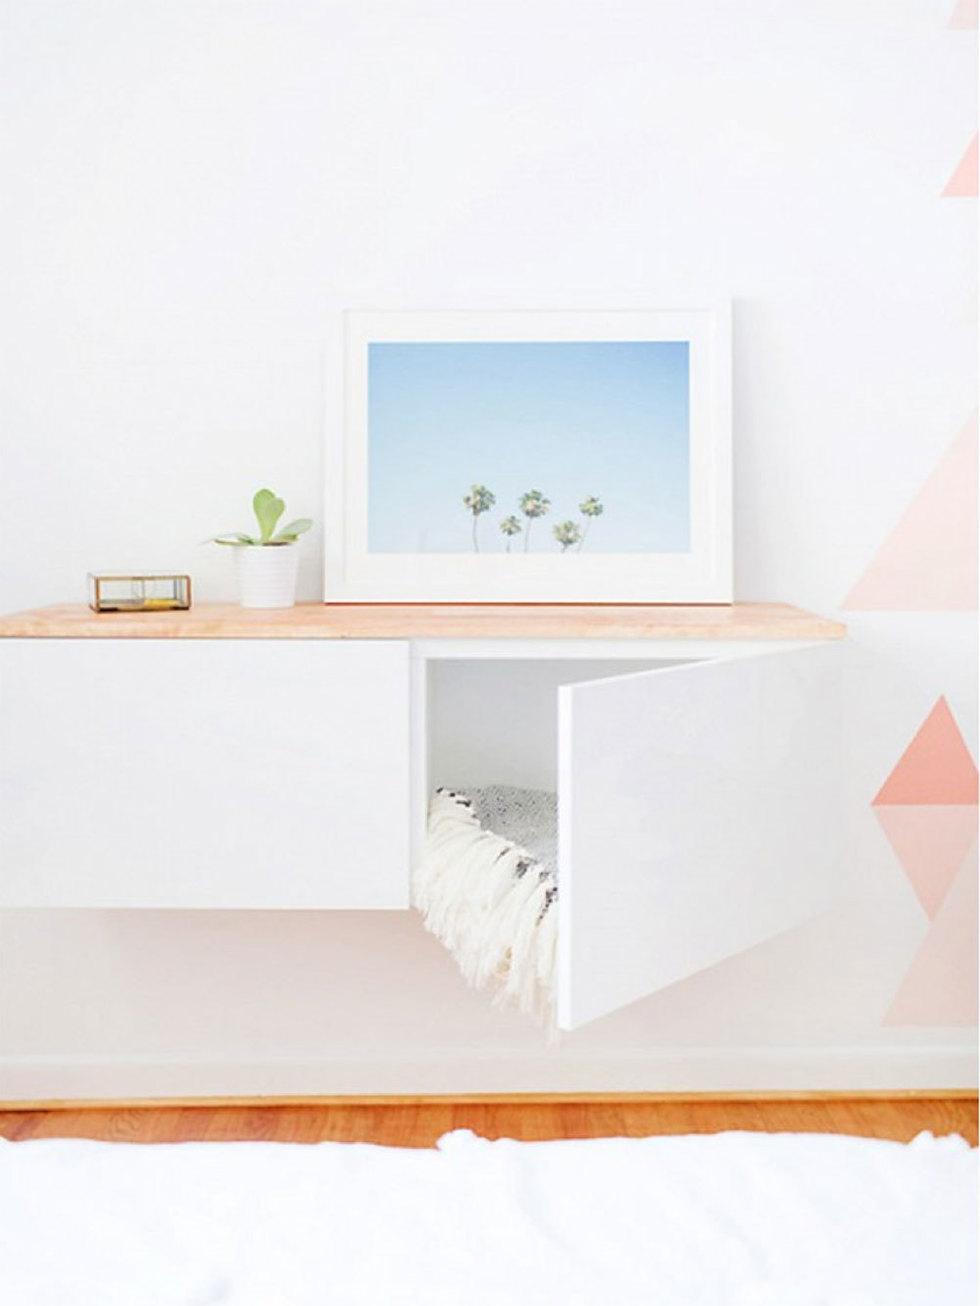 10 simpele hacks om je ikea meubels te upgraden